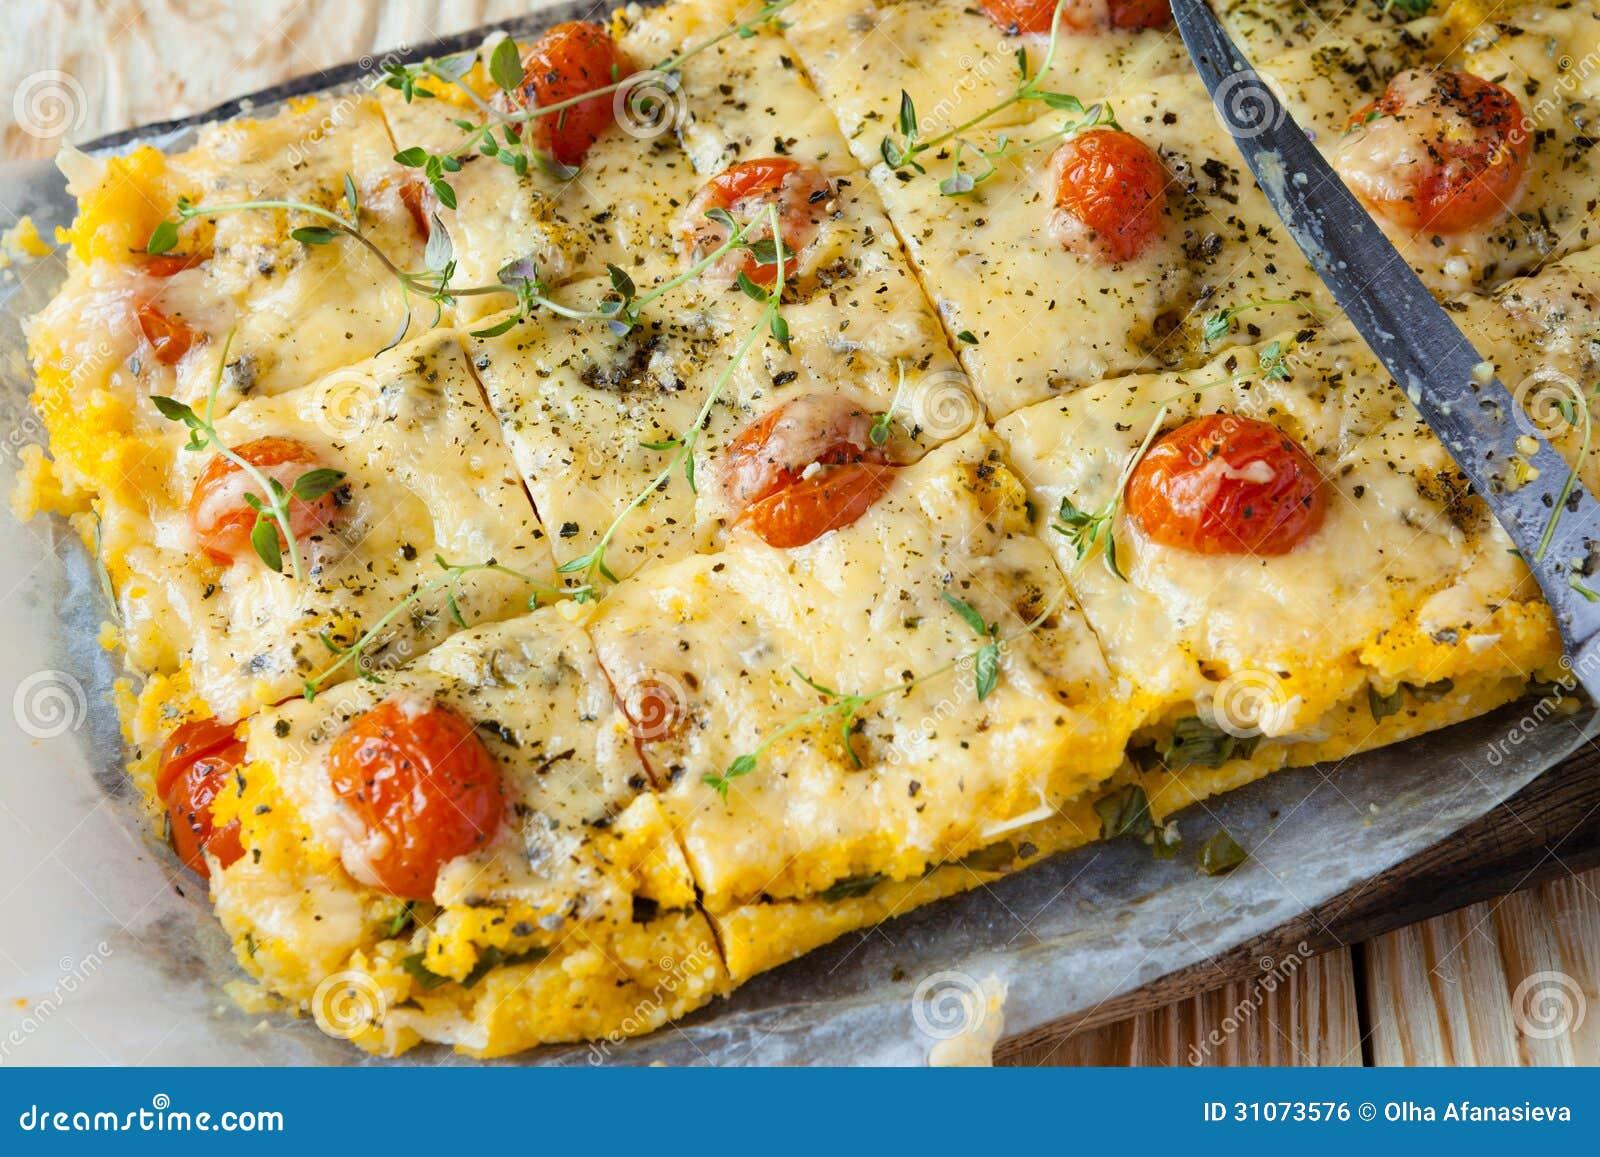 how to make polenta tasty